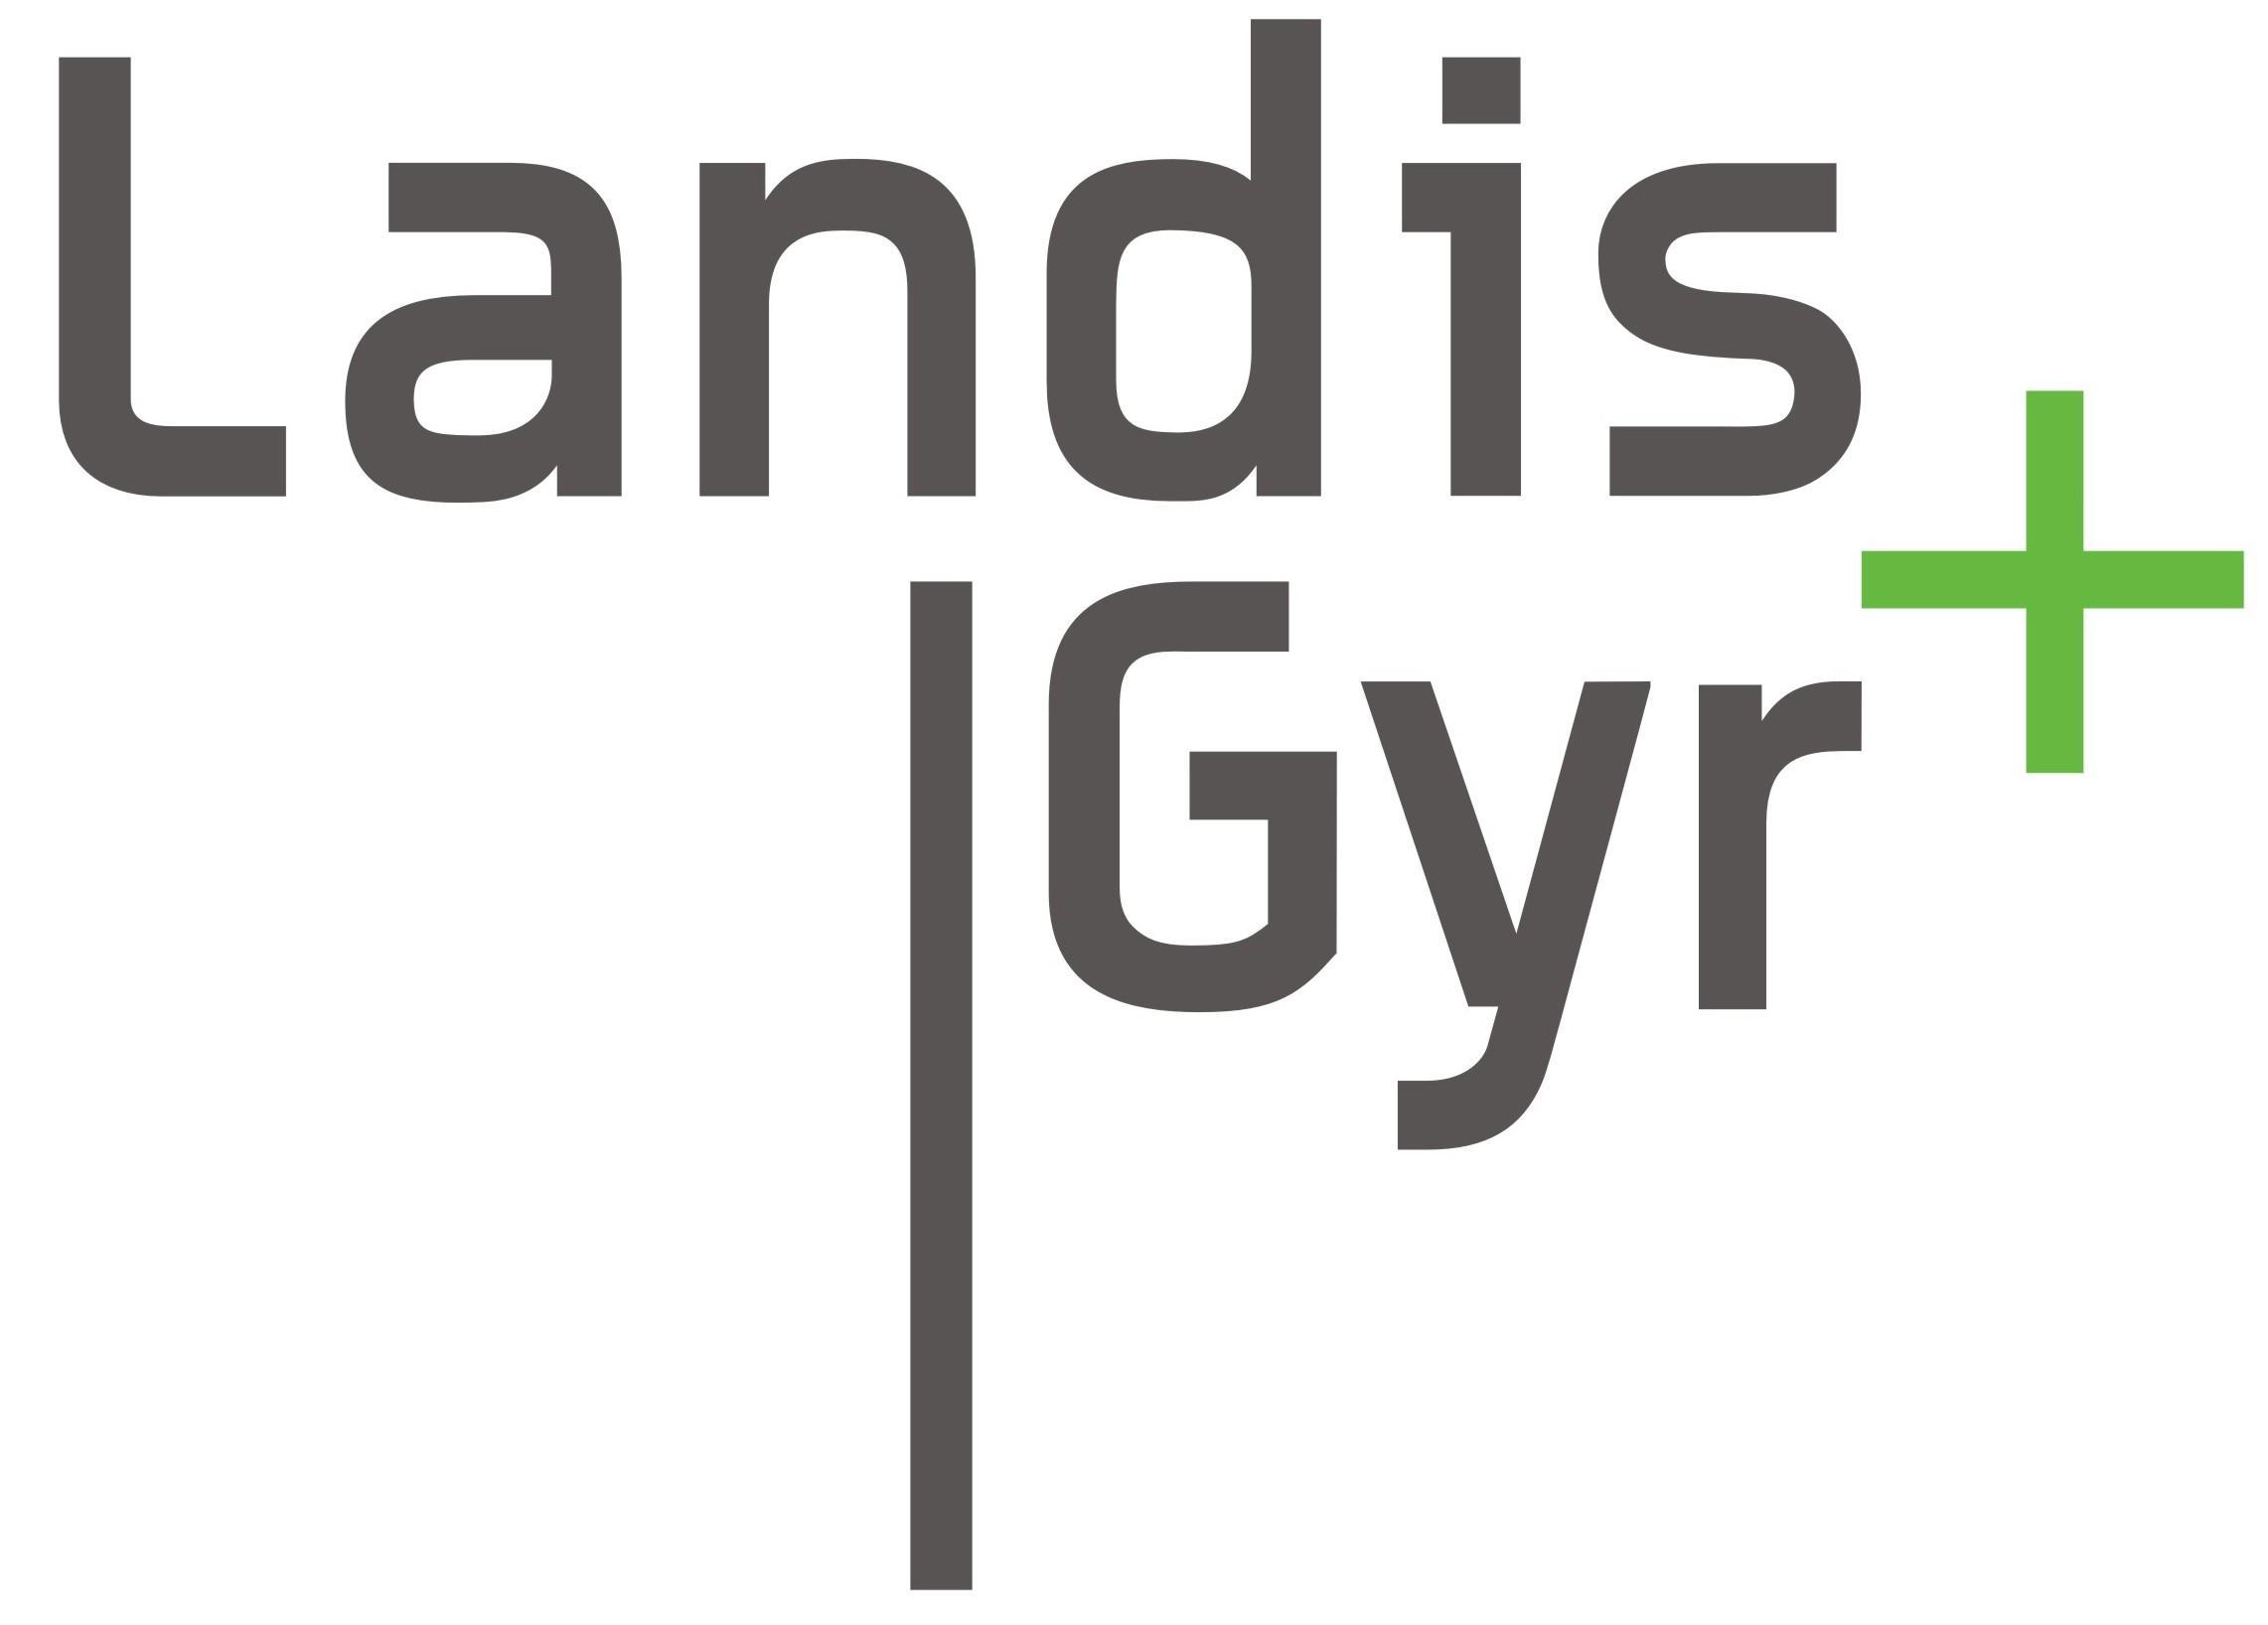 Rajattu Landis Gyrinin logo